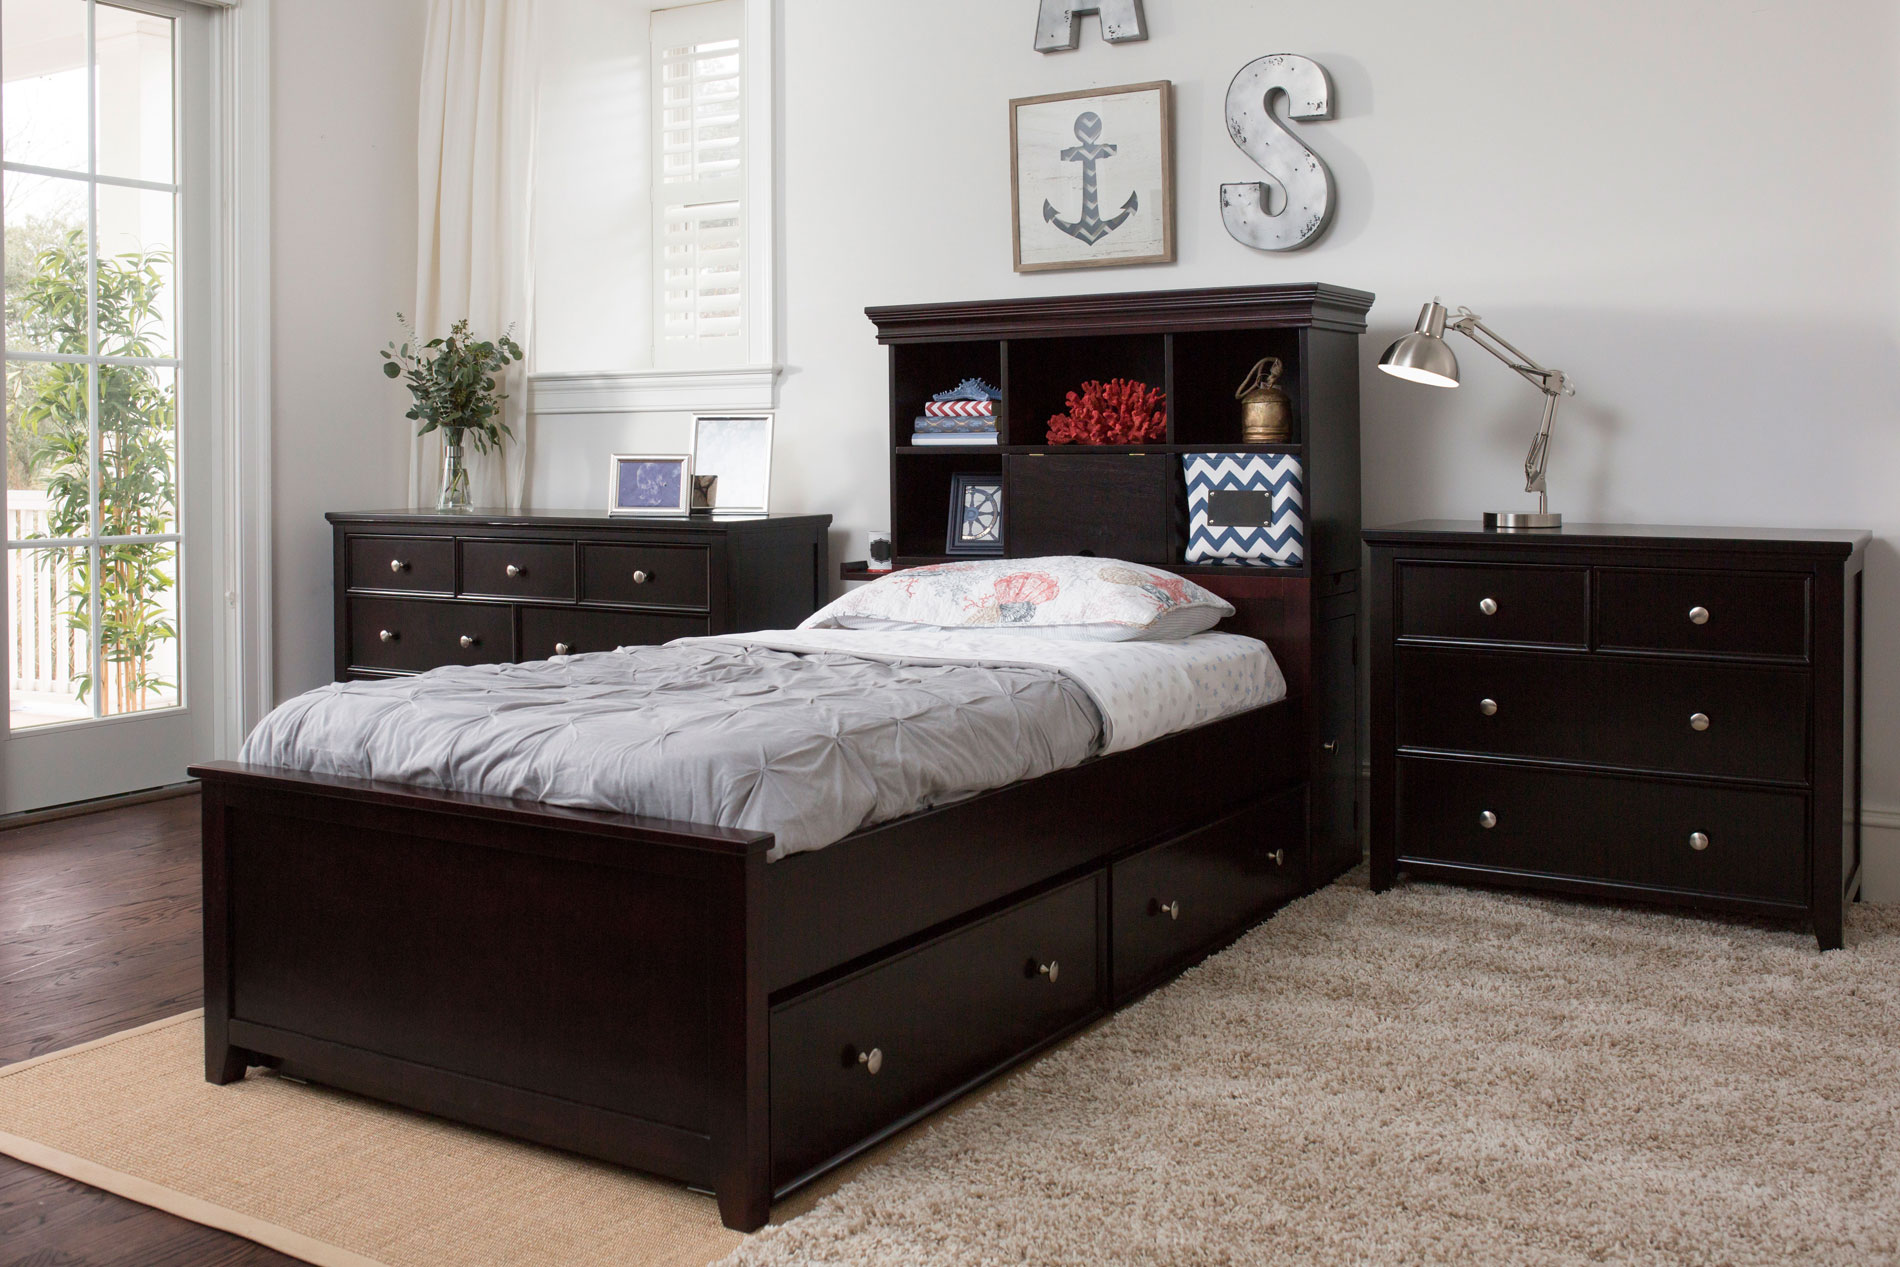 bedroom furniture sets teenage girls photo - 6